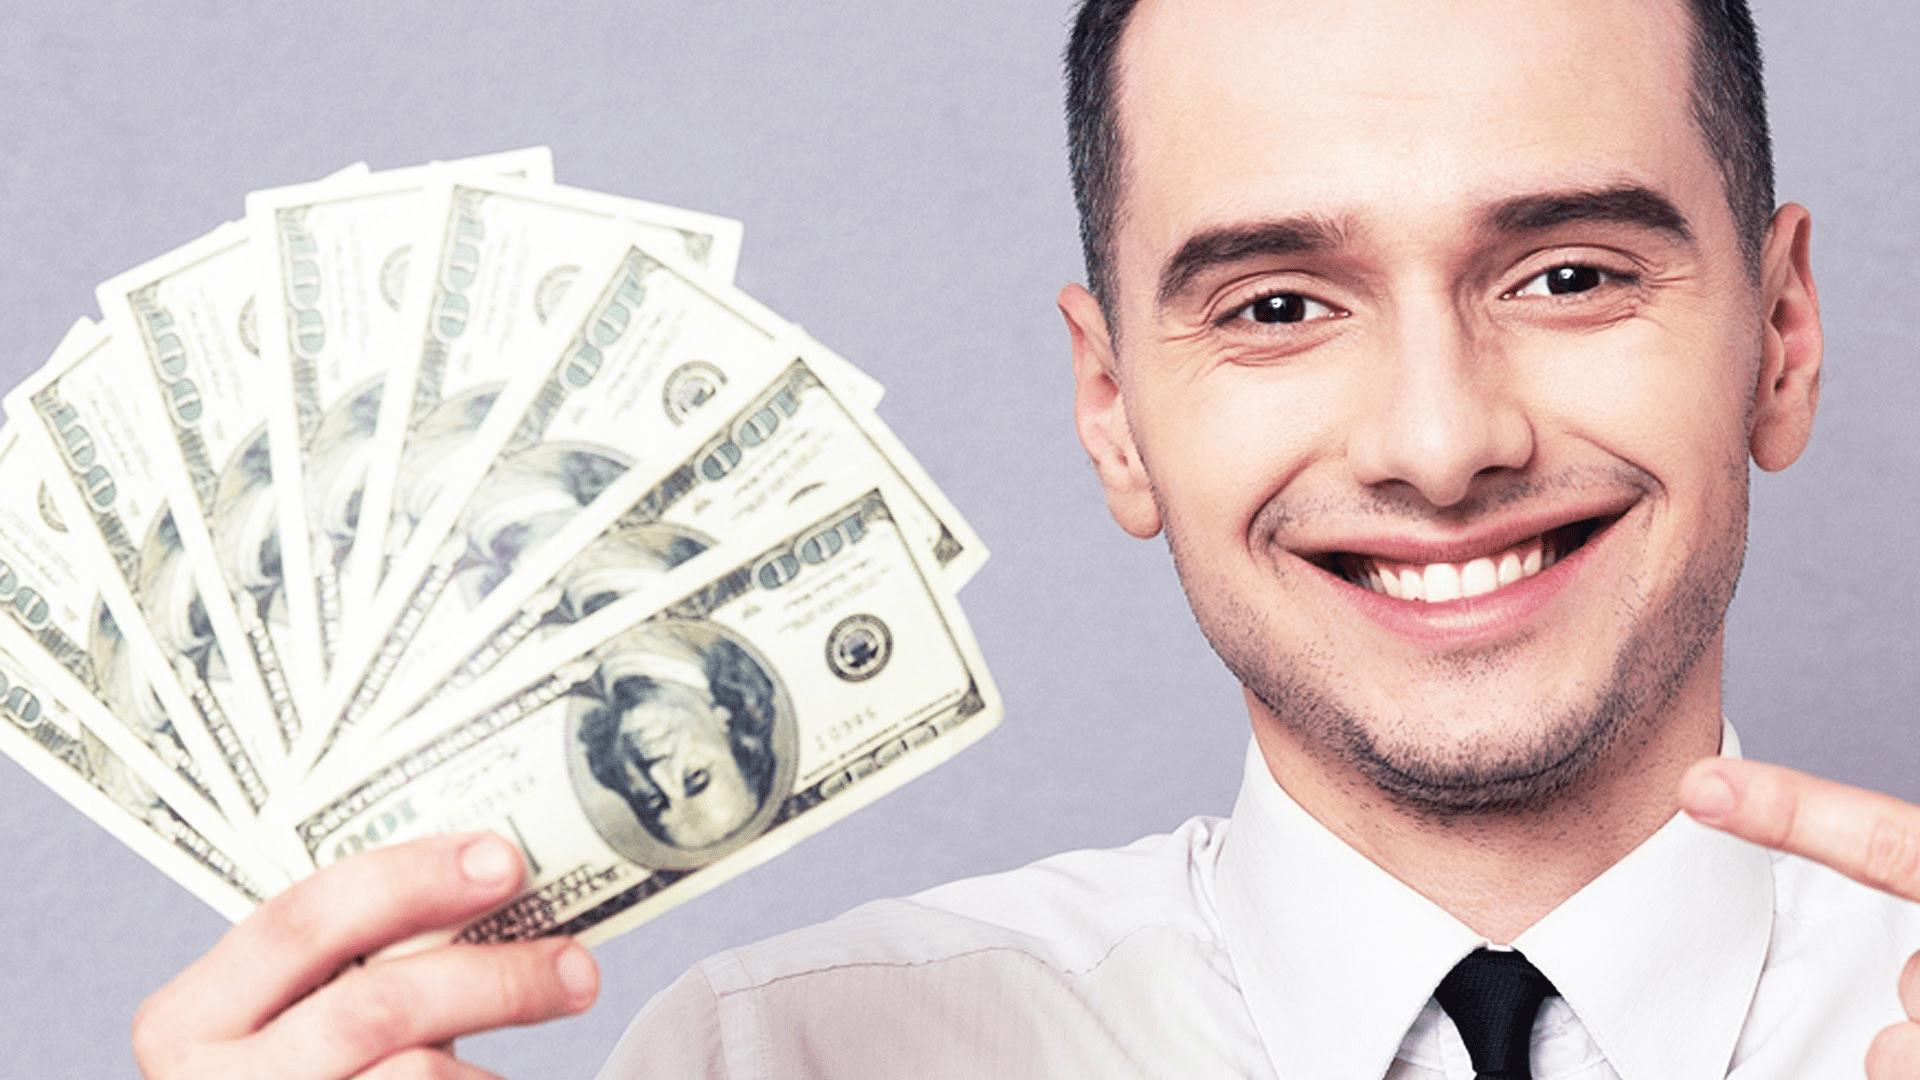 25 Fool-Proof Ways to Make 500 Dollars Fast (method 2 takes